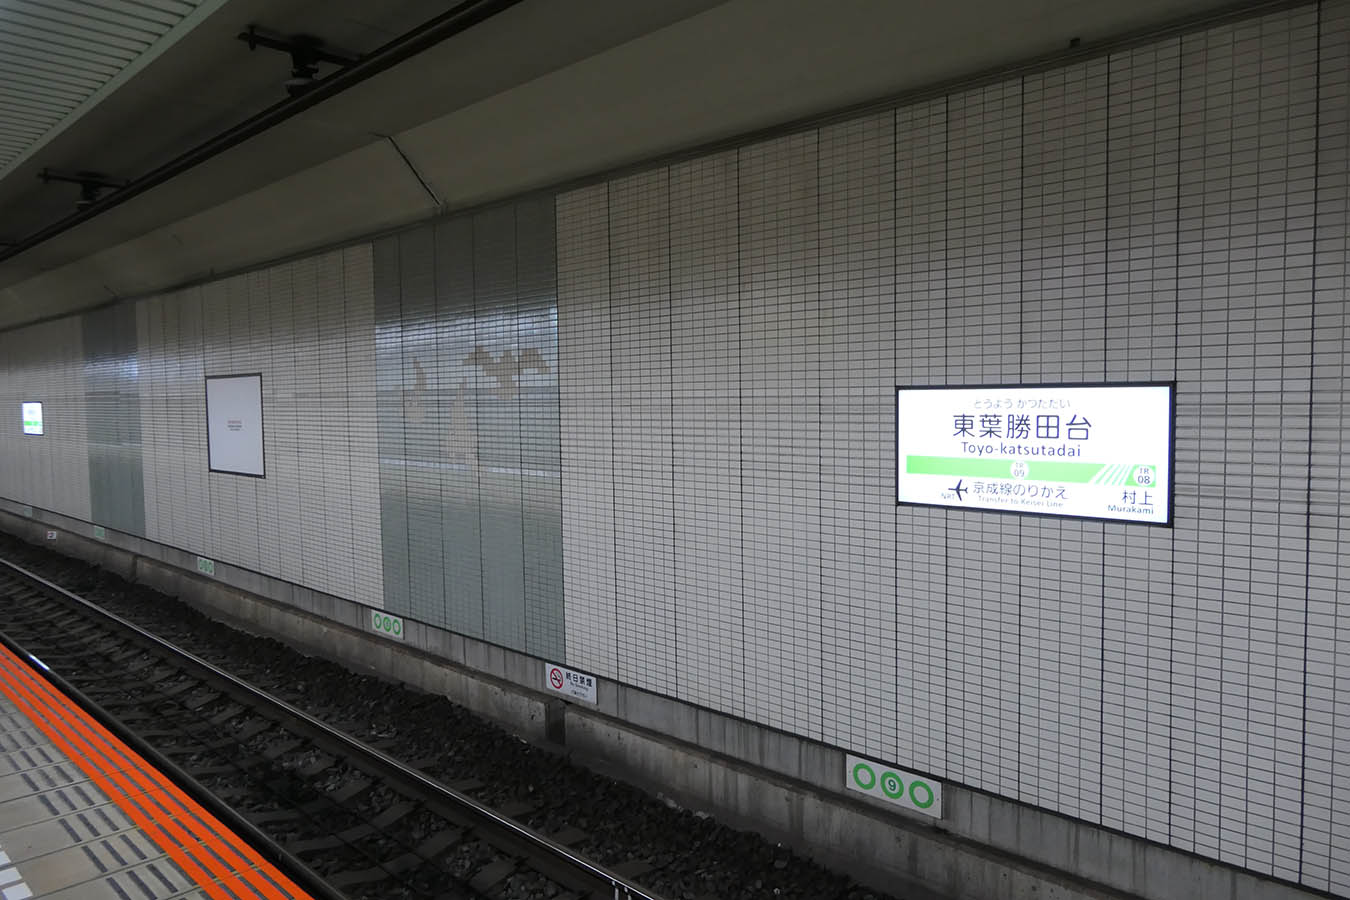 TR09_photo01.jpg